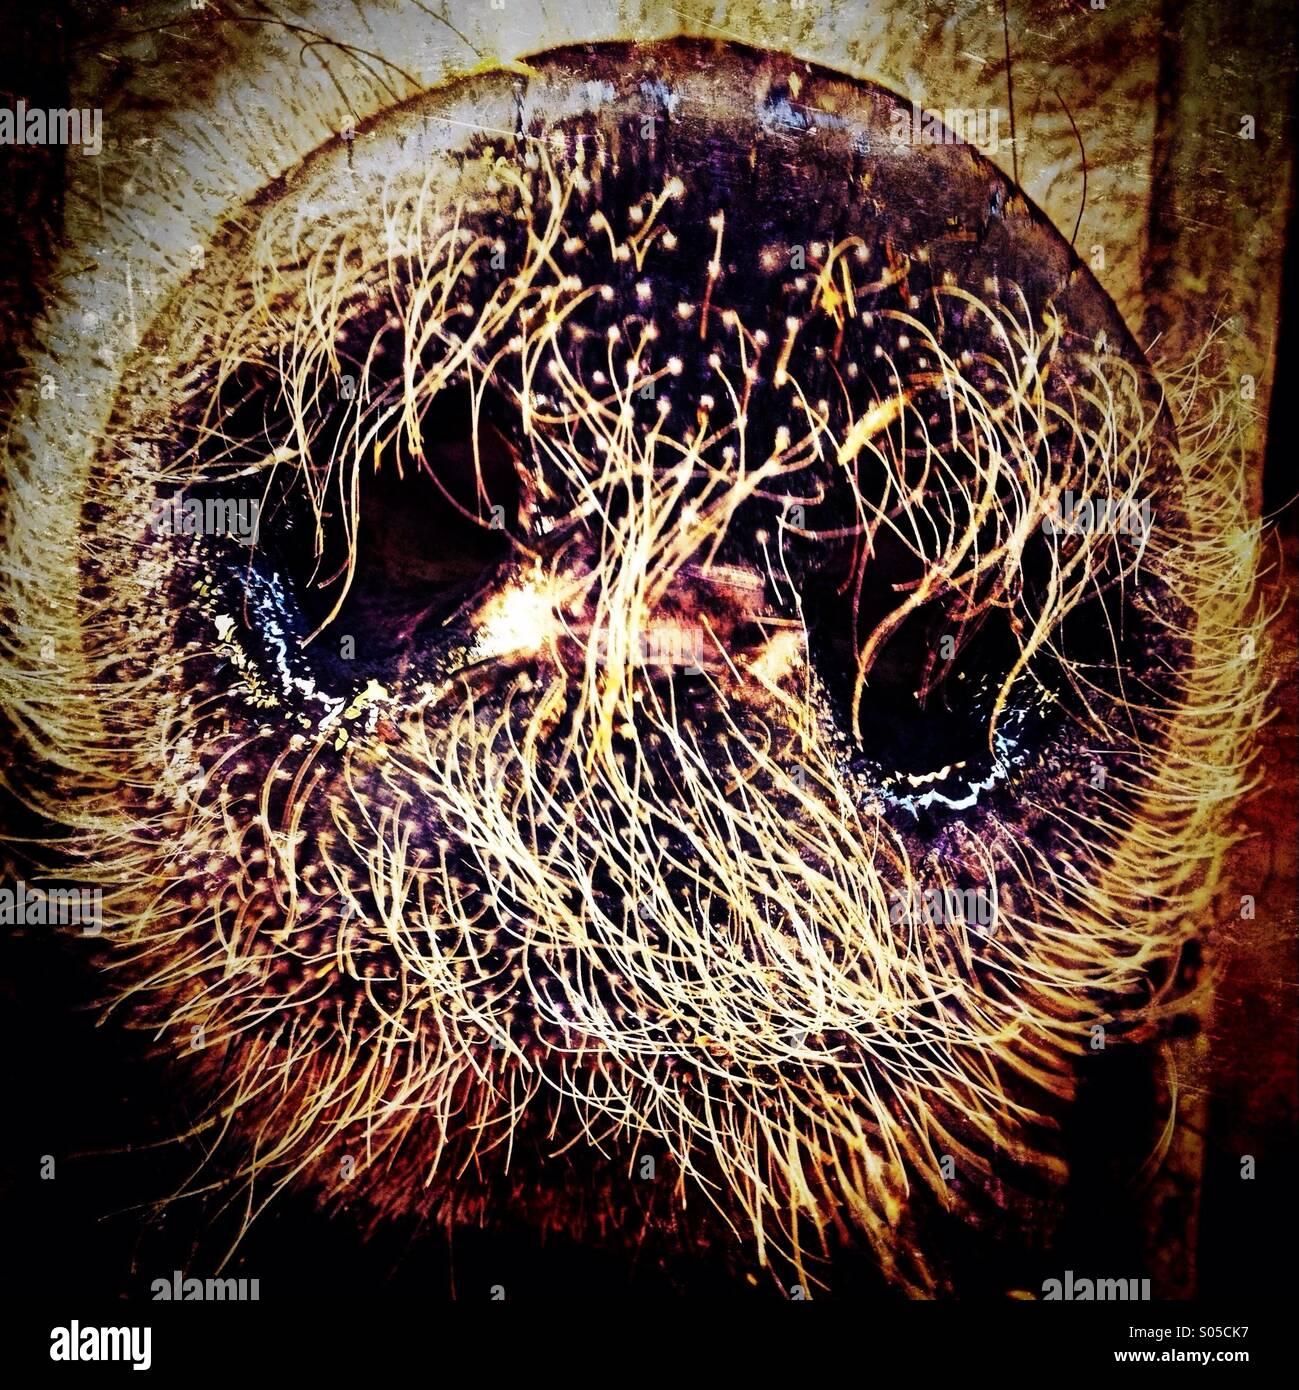 Pig snout detail - Stock Image